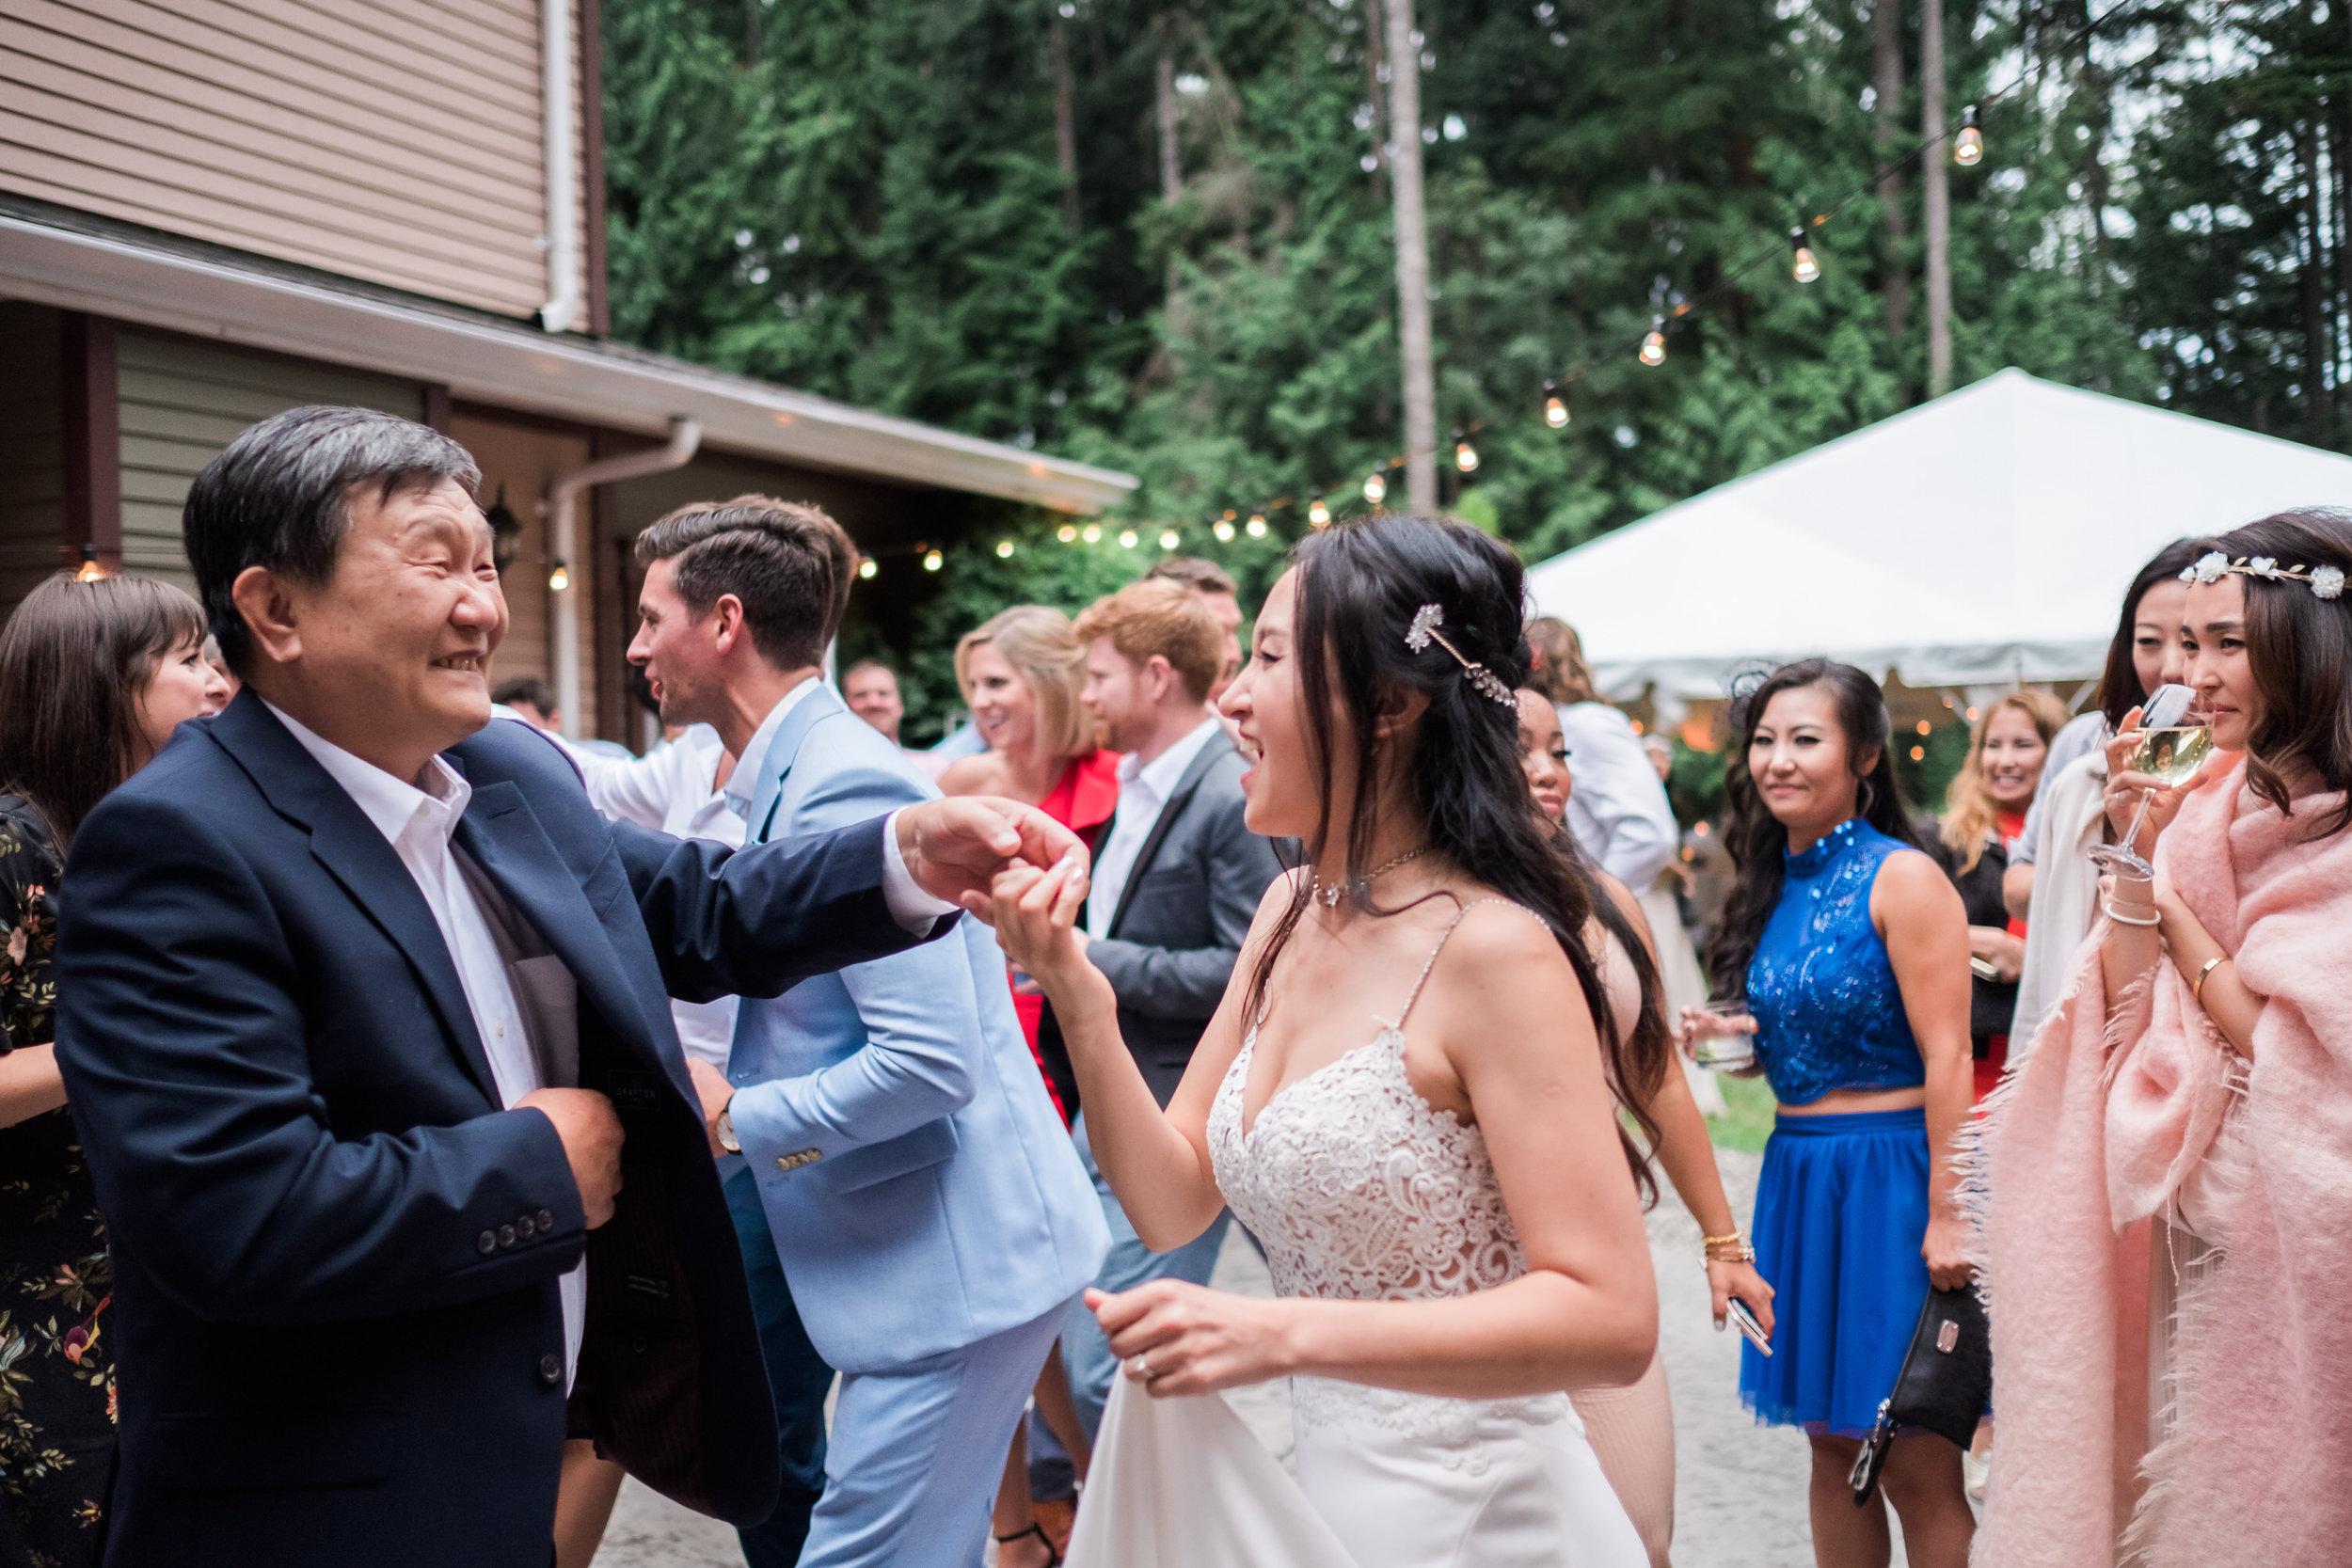 Linwood House Wedding Photos - Roberts Creek Wedding Photos - Vancouver Wedding Photographer & Videographer - Sunshine Coast Wedding Photos - Sunshine Coast Wedding Photographer - Jennifer Picard Photography - DSCF0773.jpg